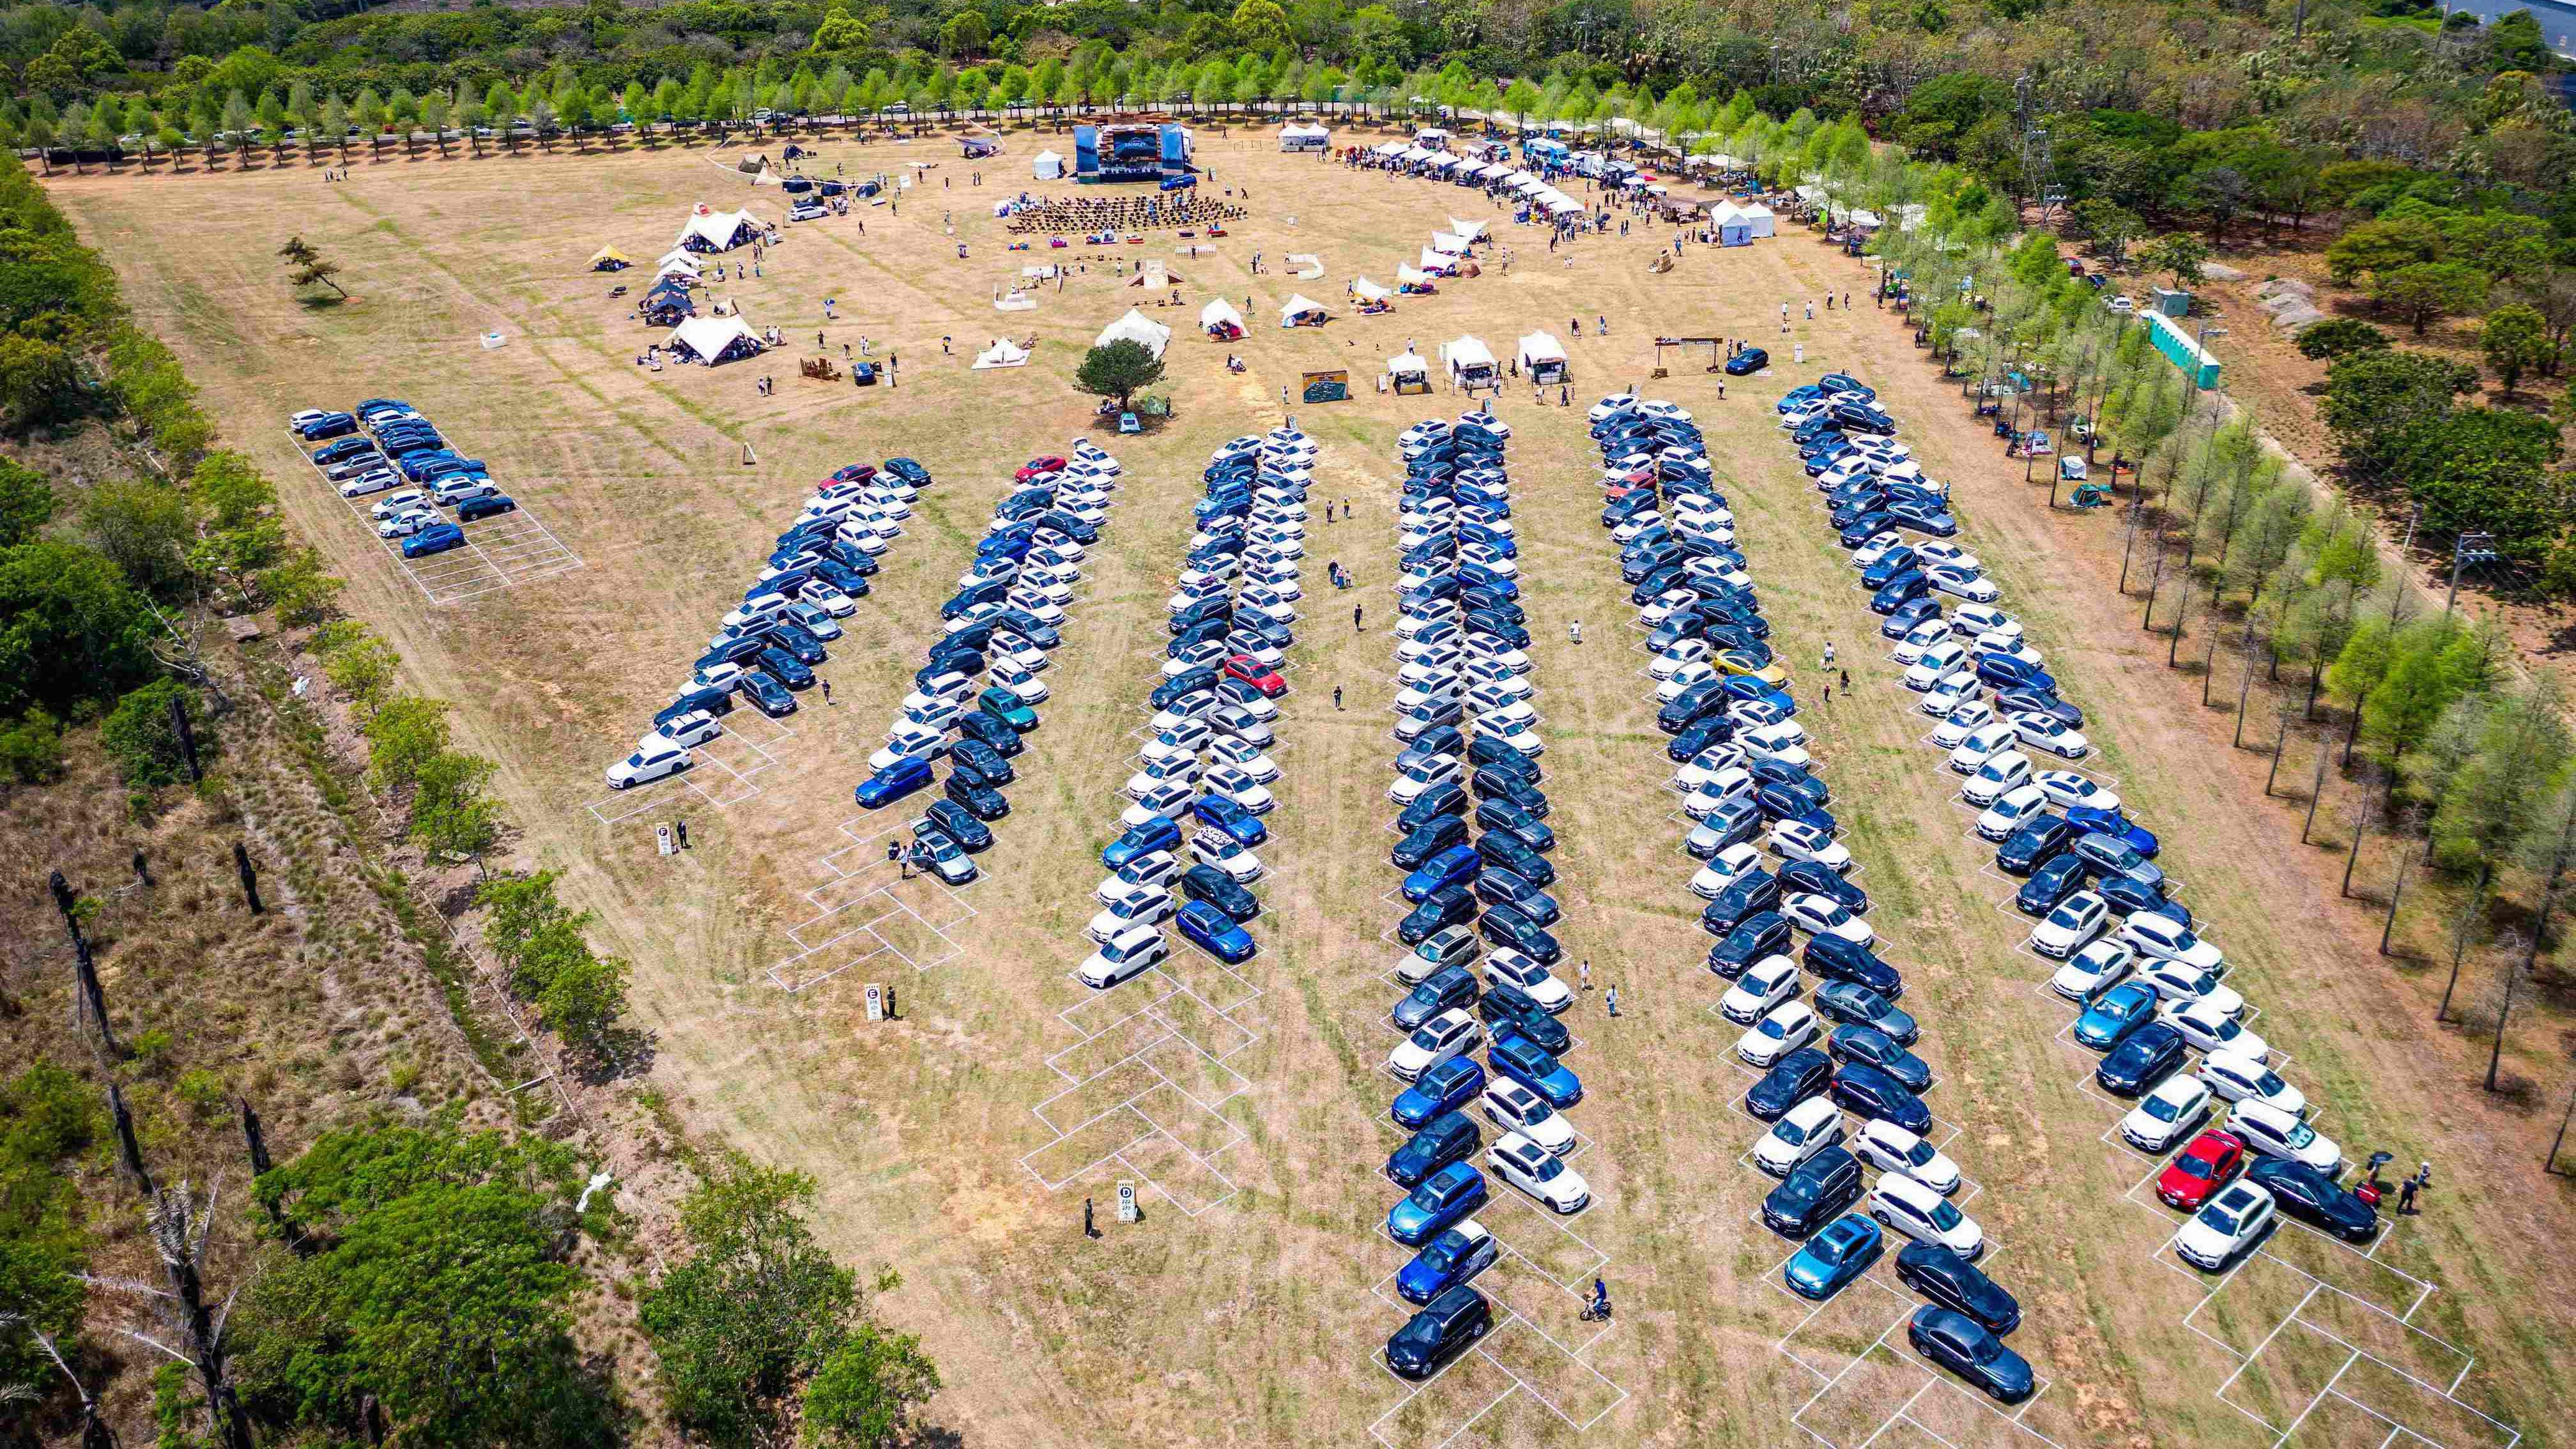 「BMW Touring Festival」近 300 台旅行車齊聚落羽松林